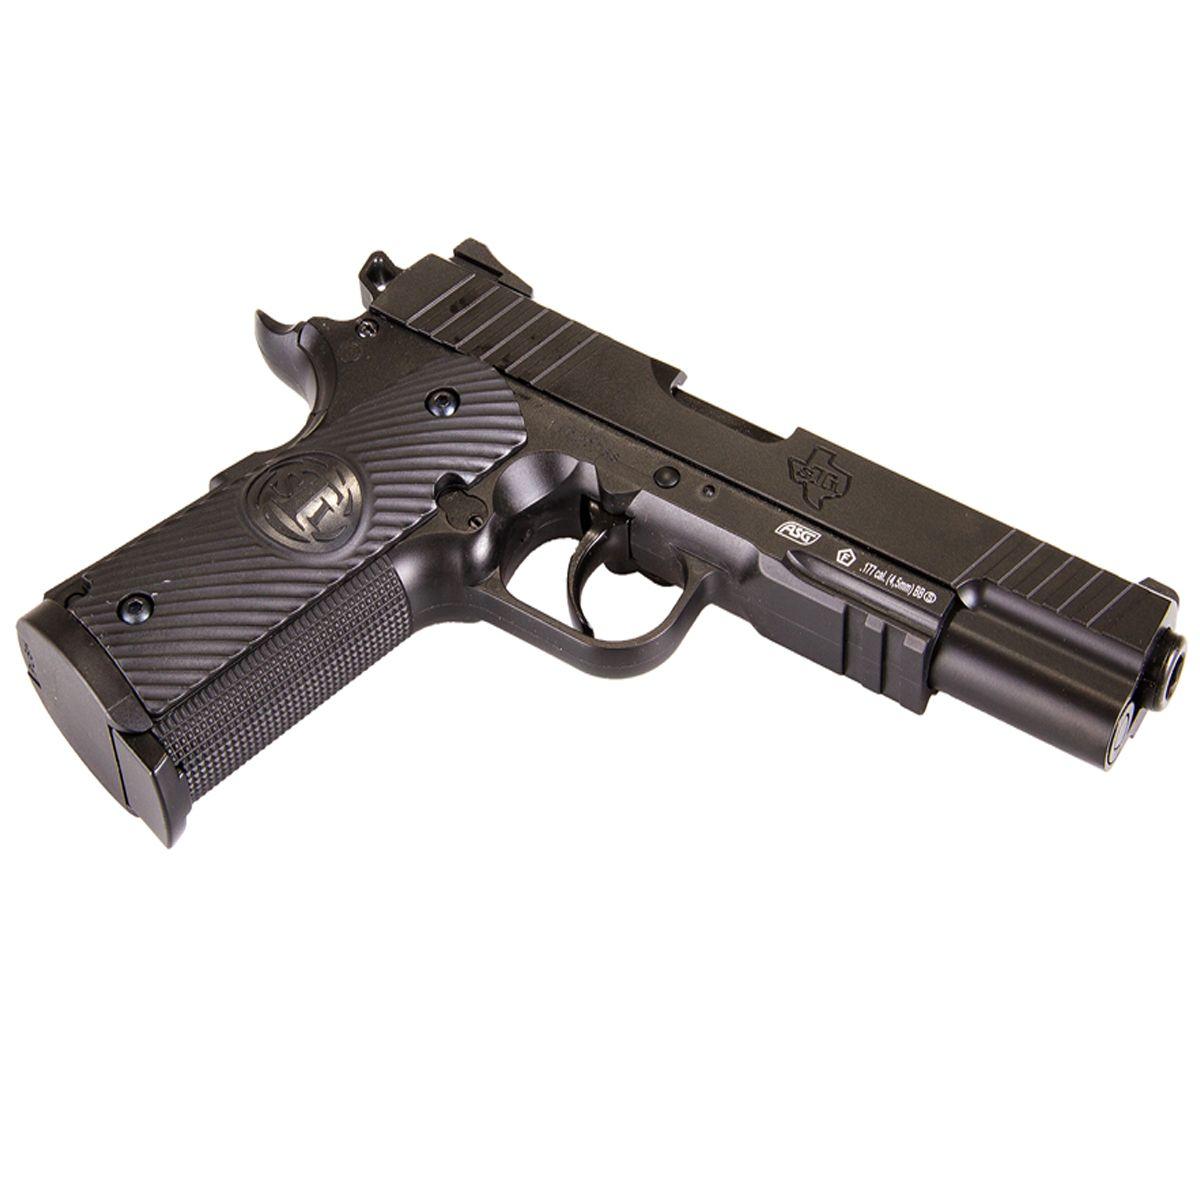 Asg 16724 airsoft pistol gbb co2 sti duty one replicaairguns ca